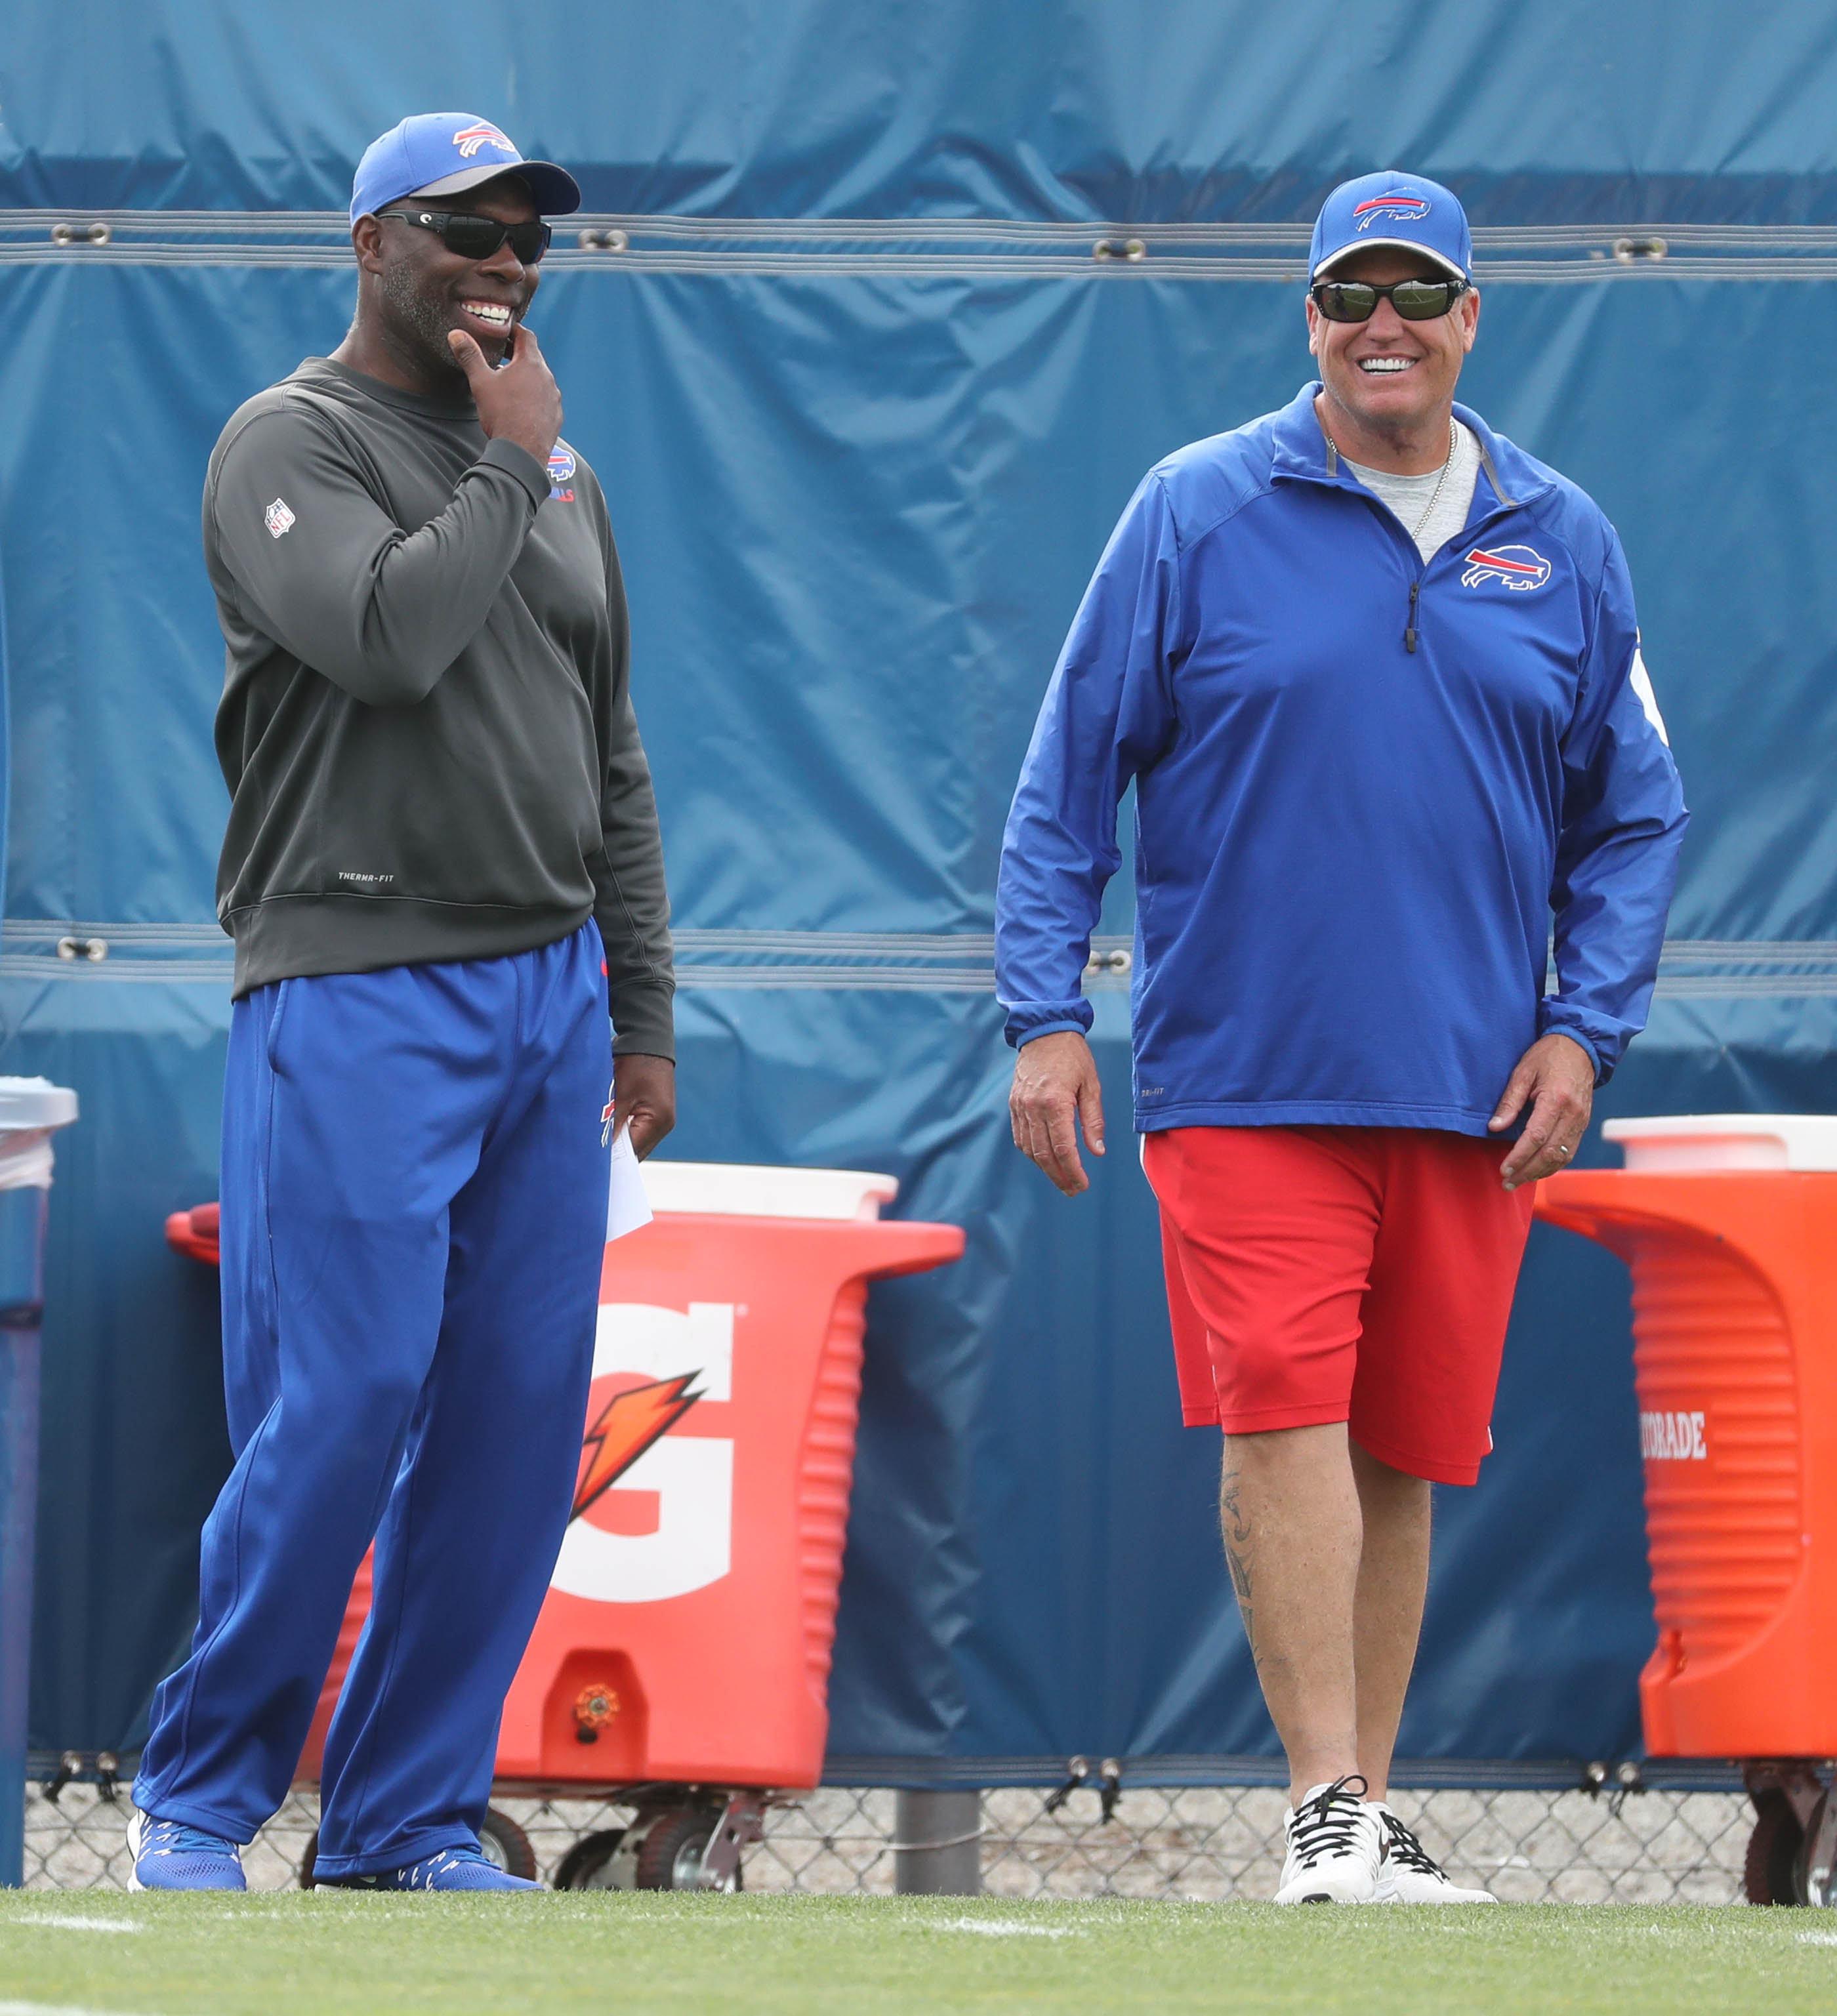 Bills coach Rex Ryan and offensive coordinator Anthony Lynn are riding a four-game win streak. (James P. McCoy/ Buffalo News)